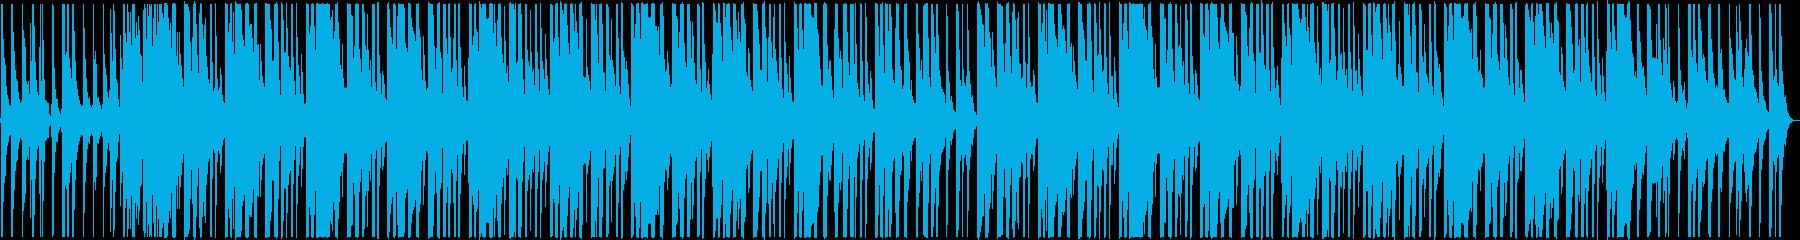 okinawa_hiphopの再生済みの波形